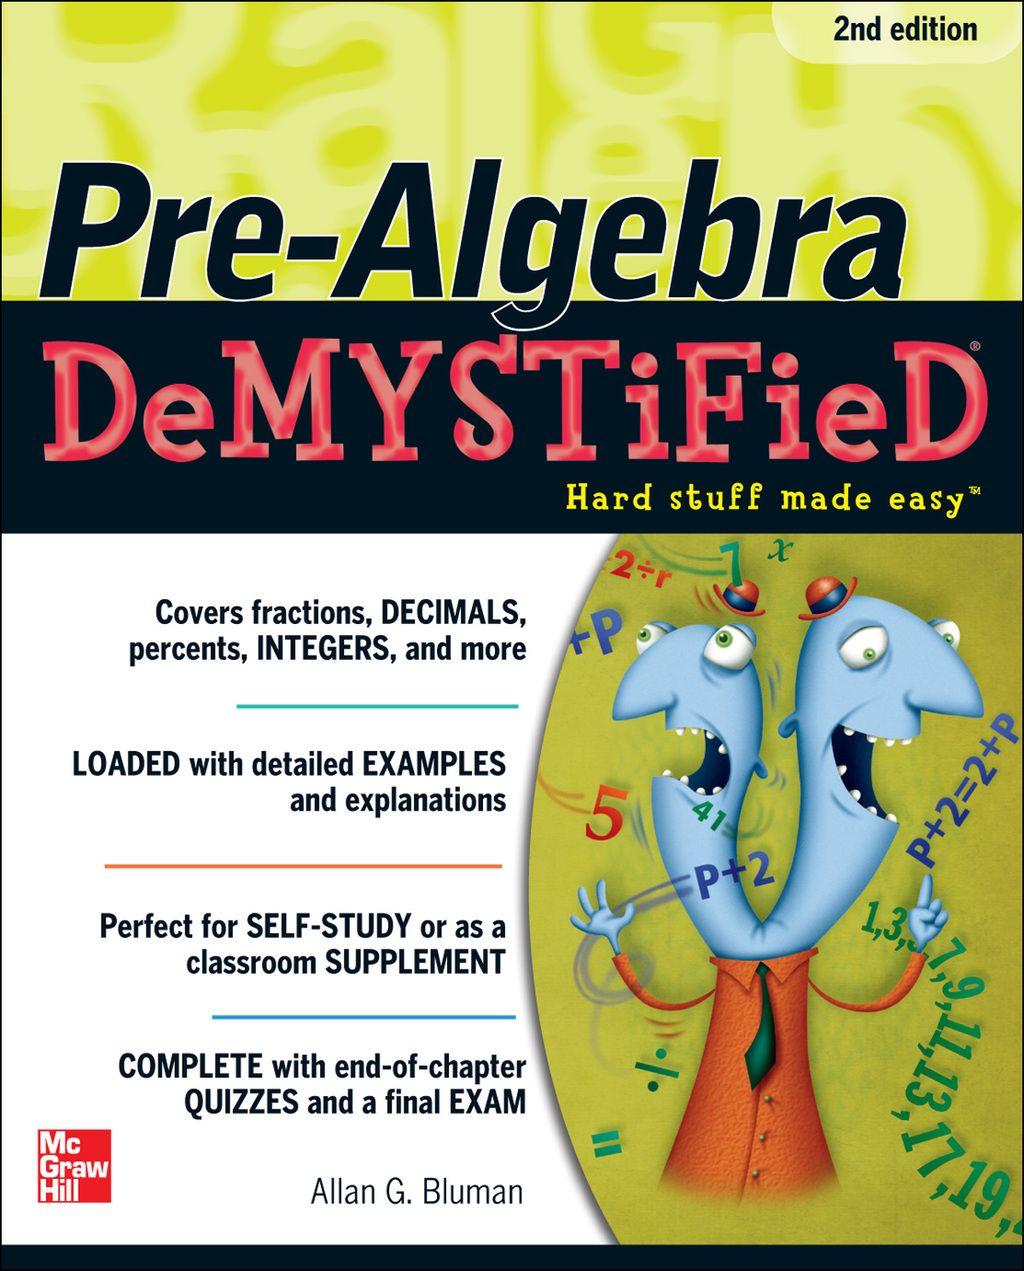 Pre Algebra Demystified Second Edition Ebook In